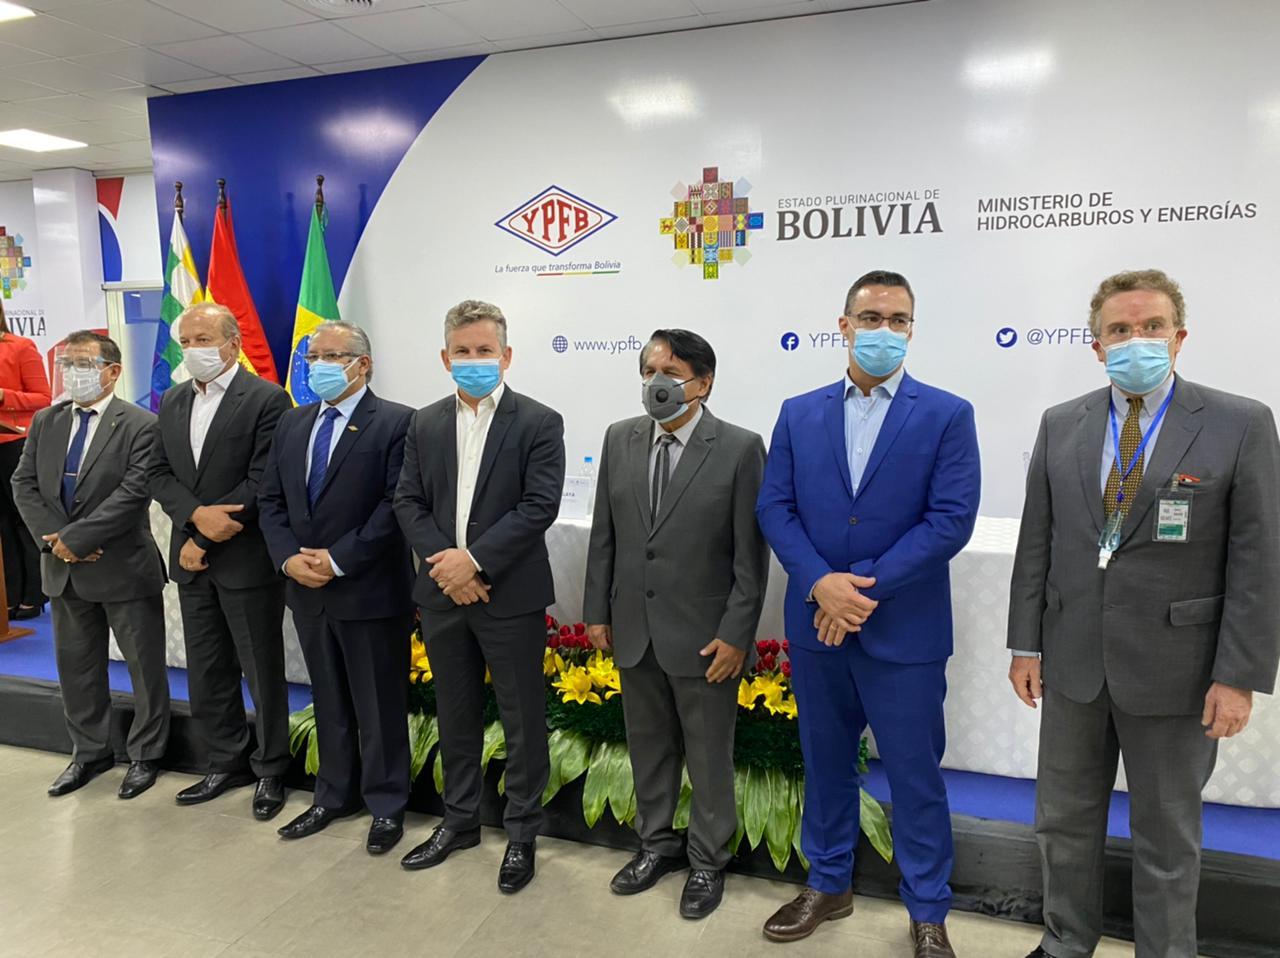 Mendes assina contrato para fornecimento de gás natural da Bolívia 2